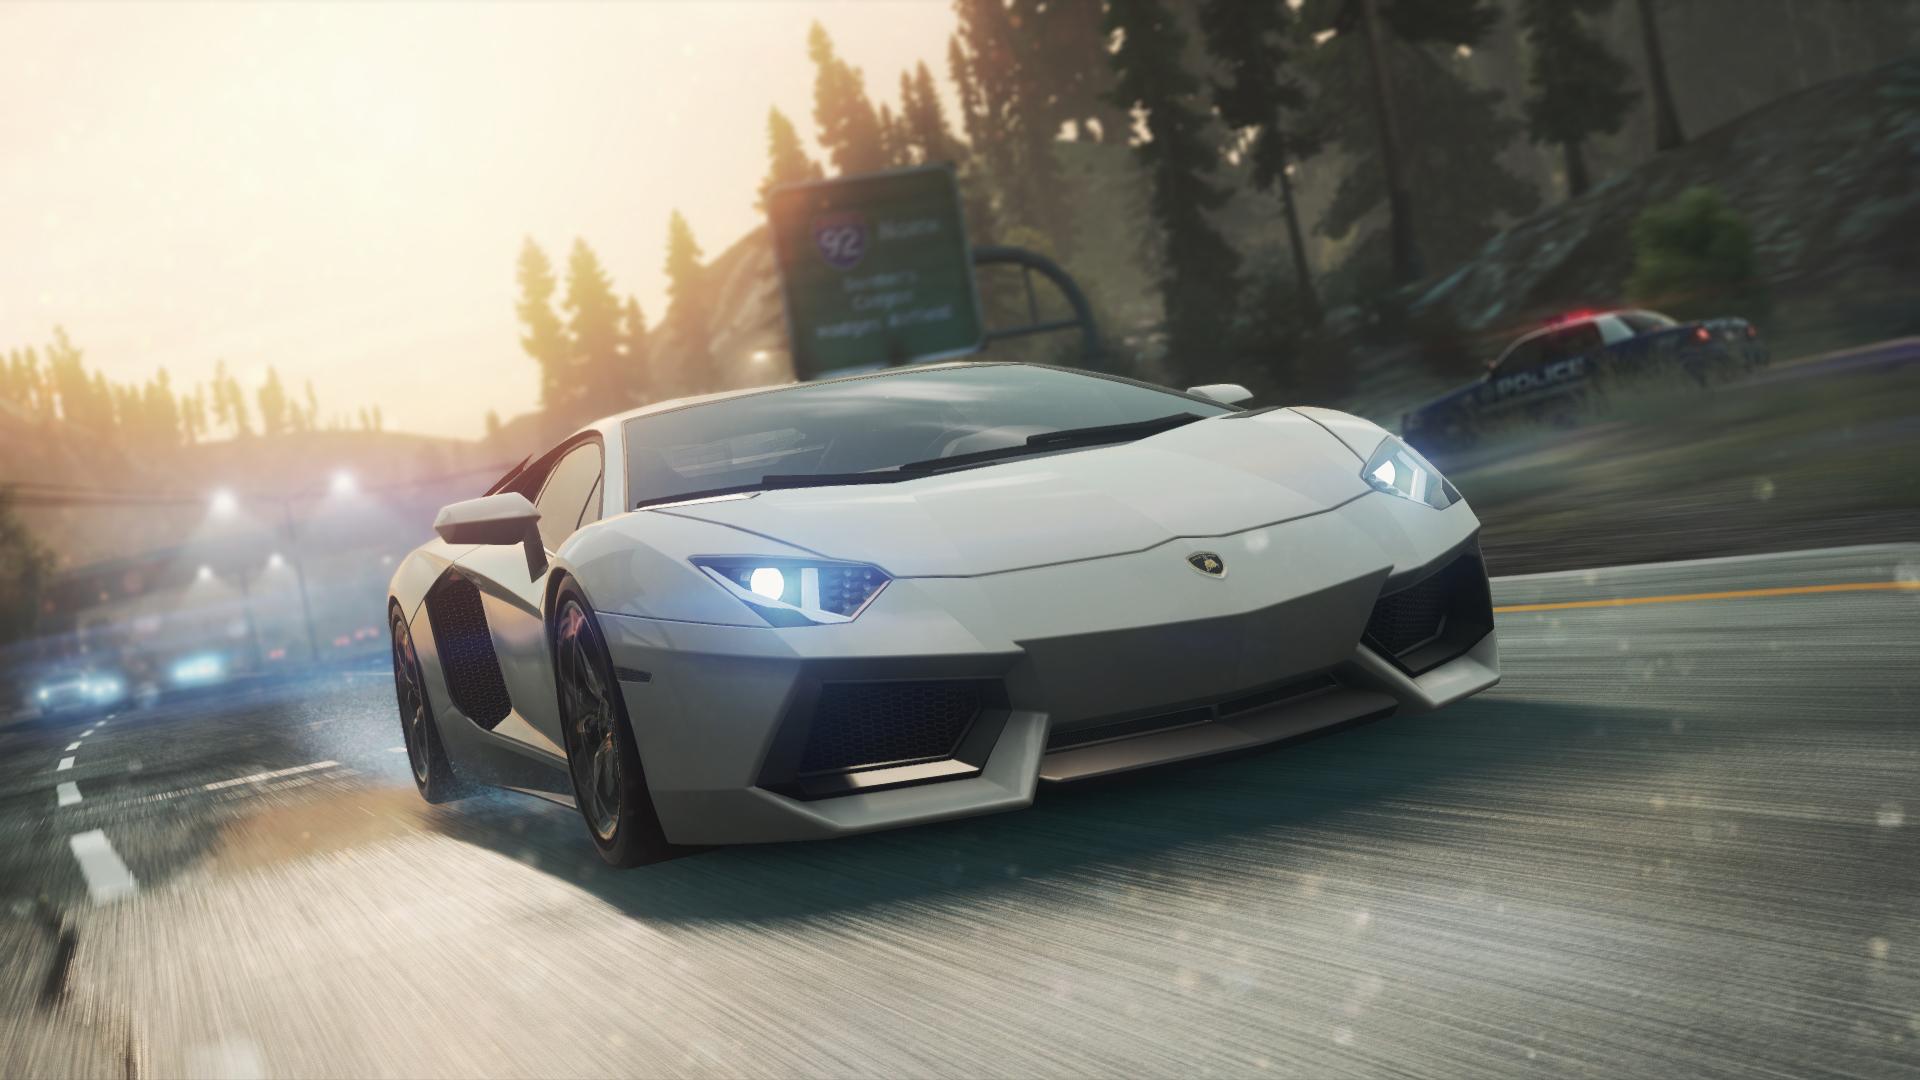 Need for Speed Rivals Wallpaper - WallpaperSafari